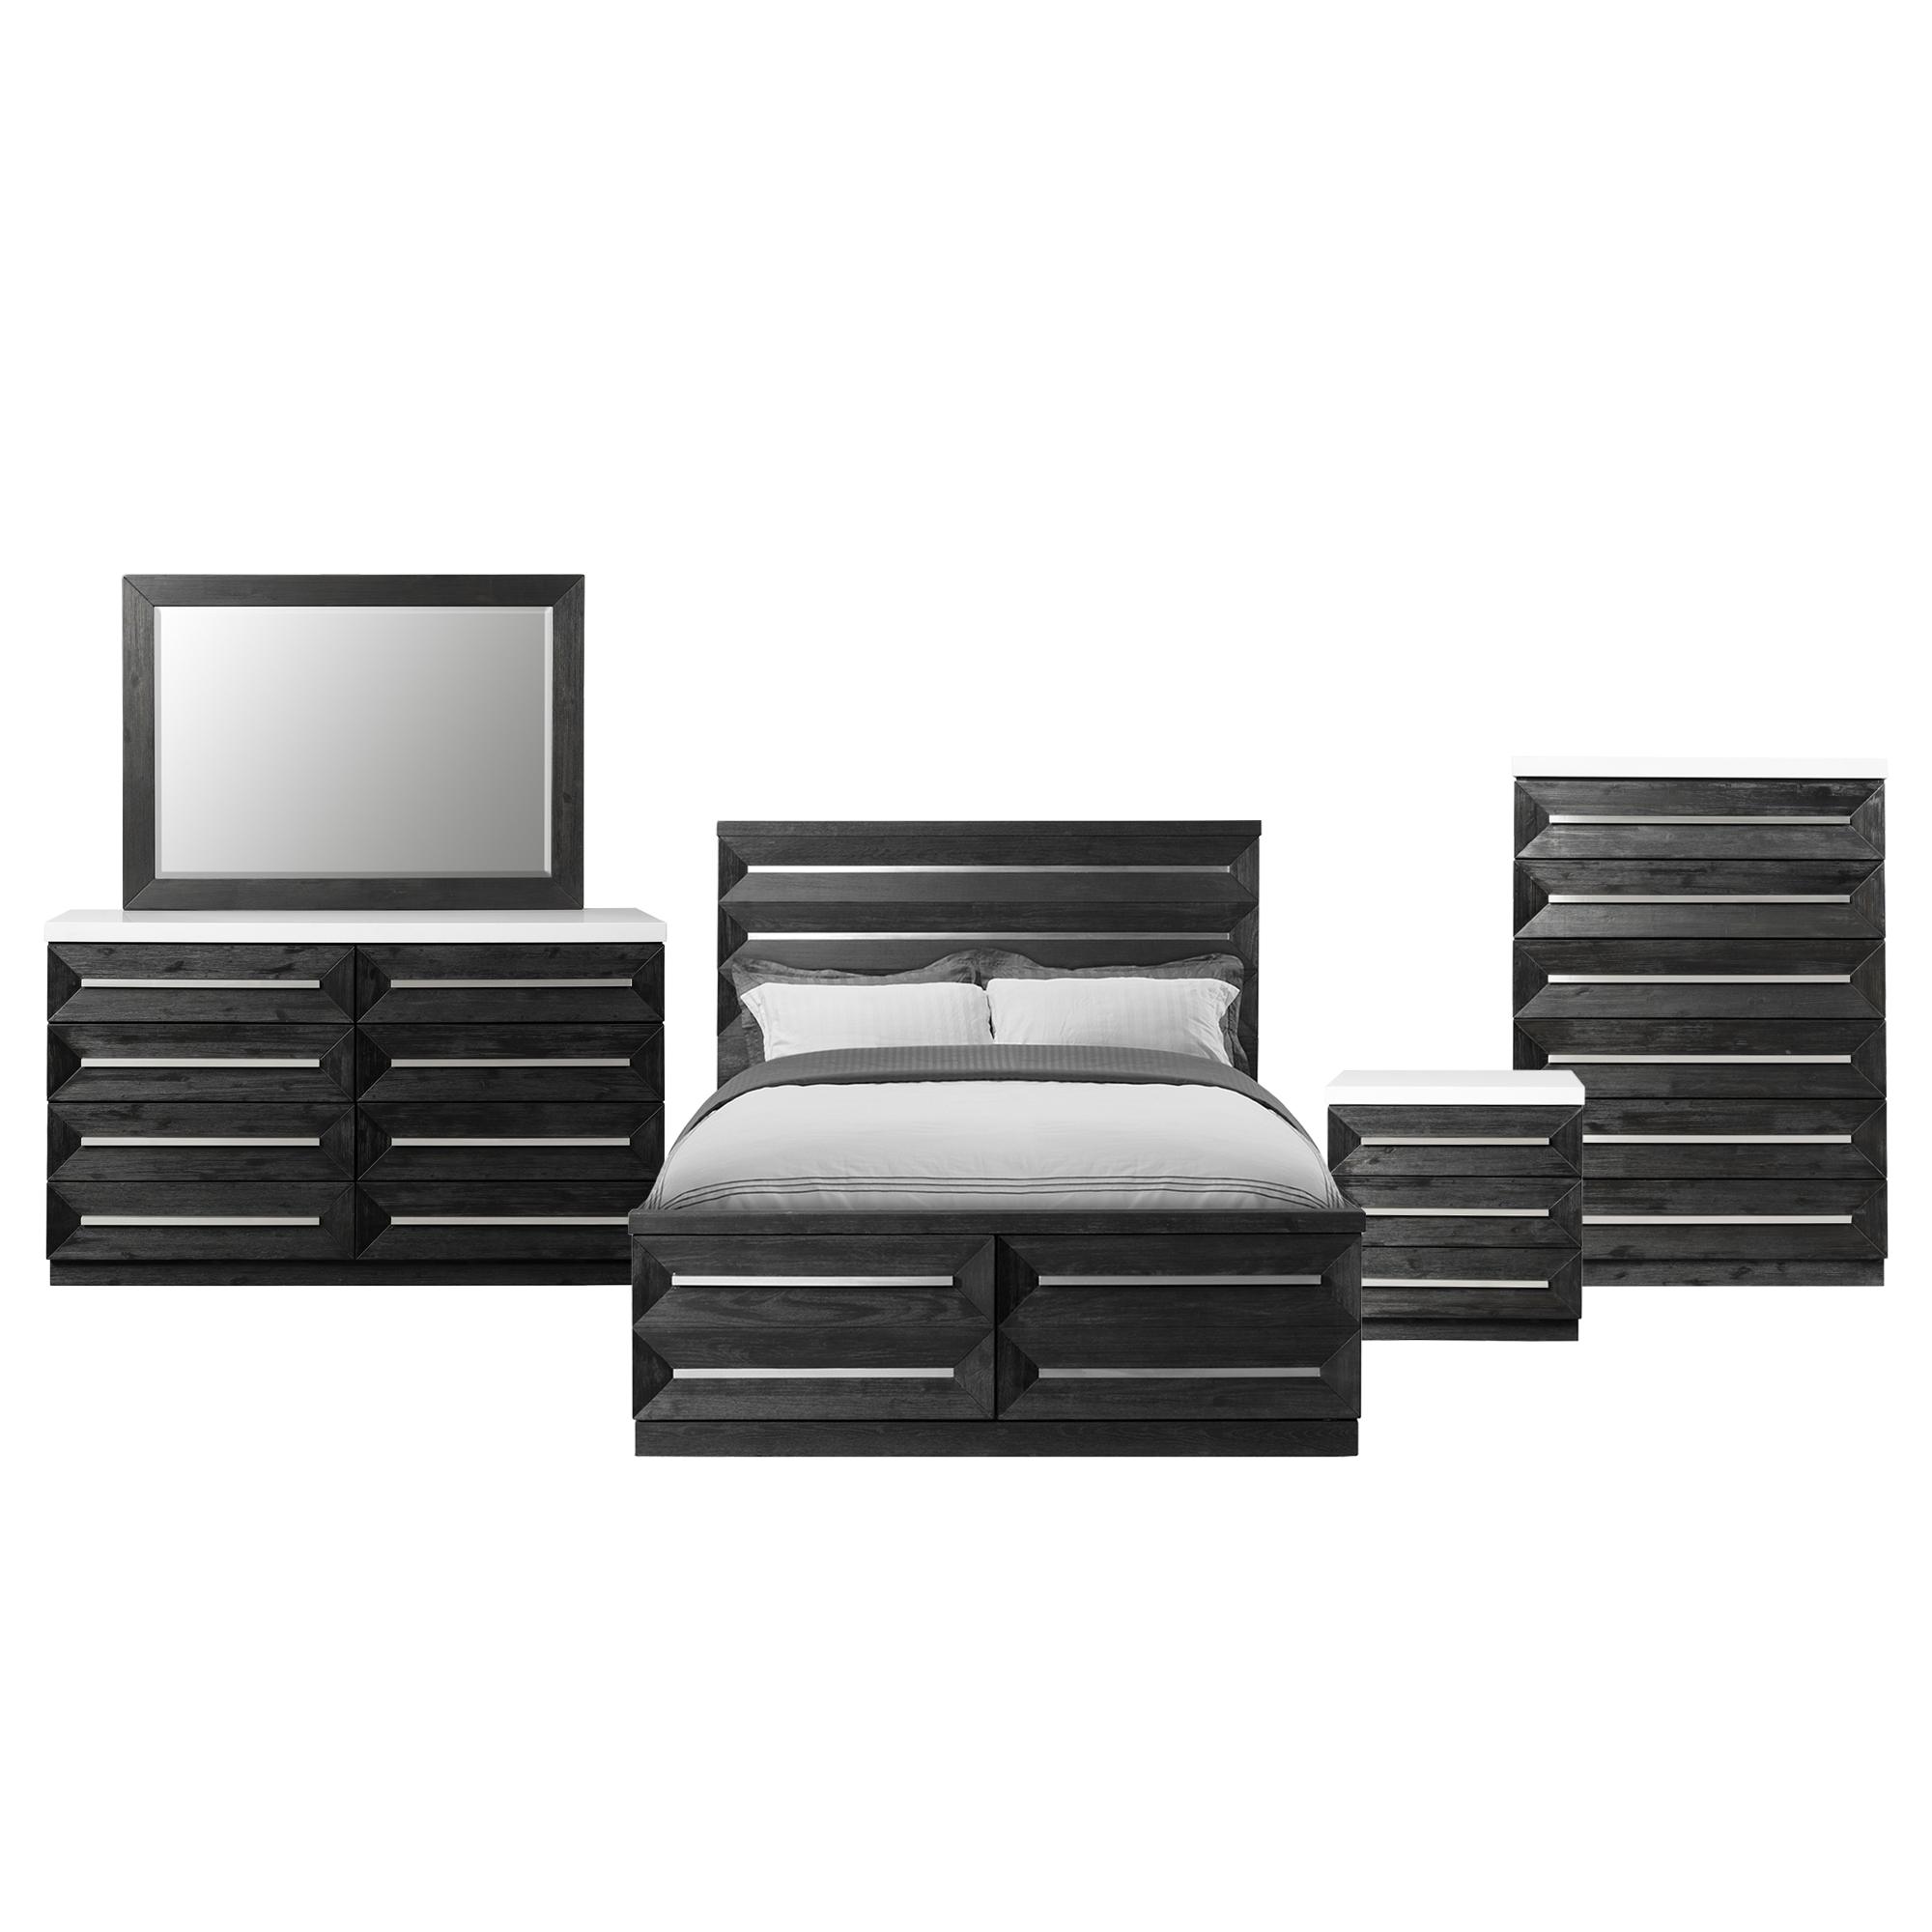 Picket House Furnishings Grace King Storage 5PC Bedroom Set